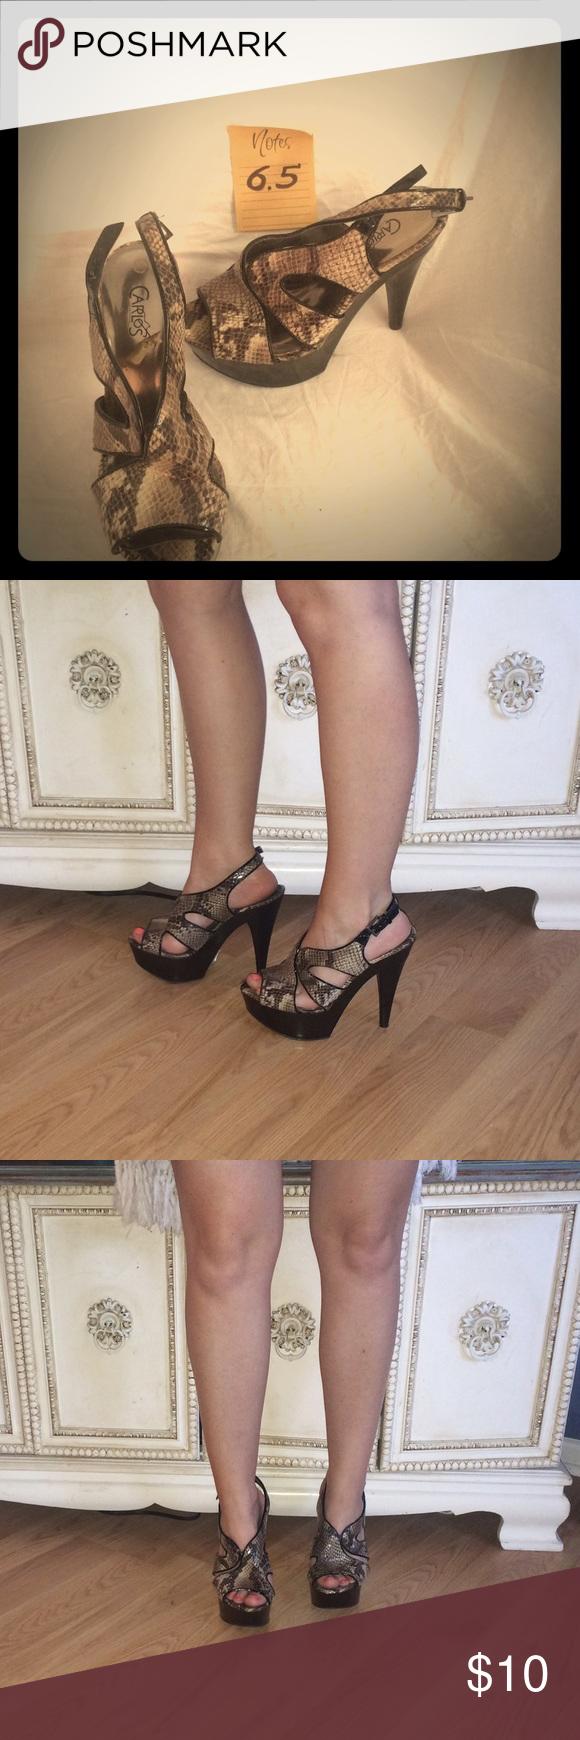 Carlos Santana snake print stilettos Ssssssexy Sssssnake print heels Carlos Santana Shoes Heels